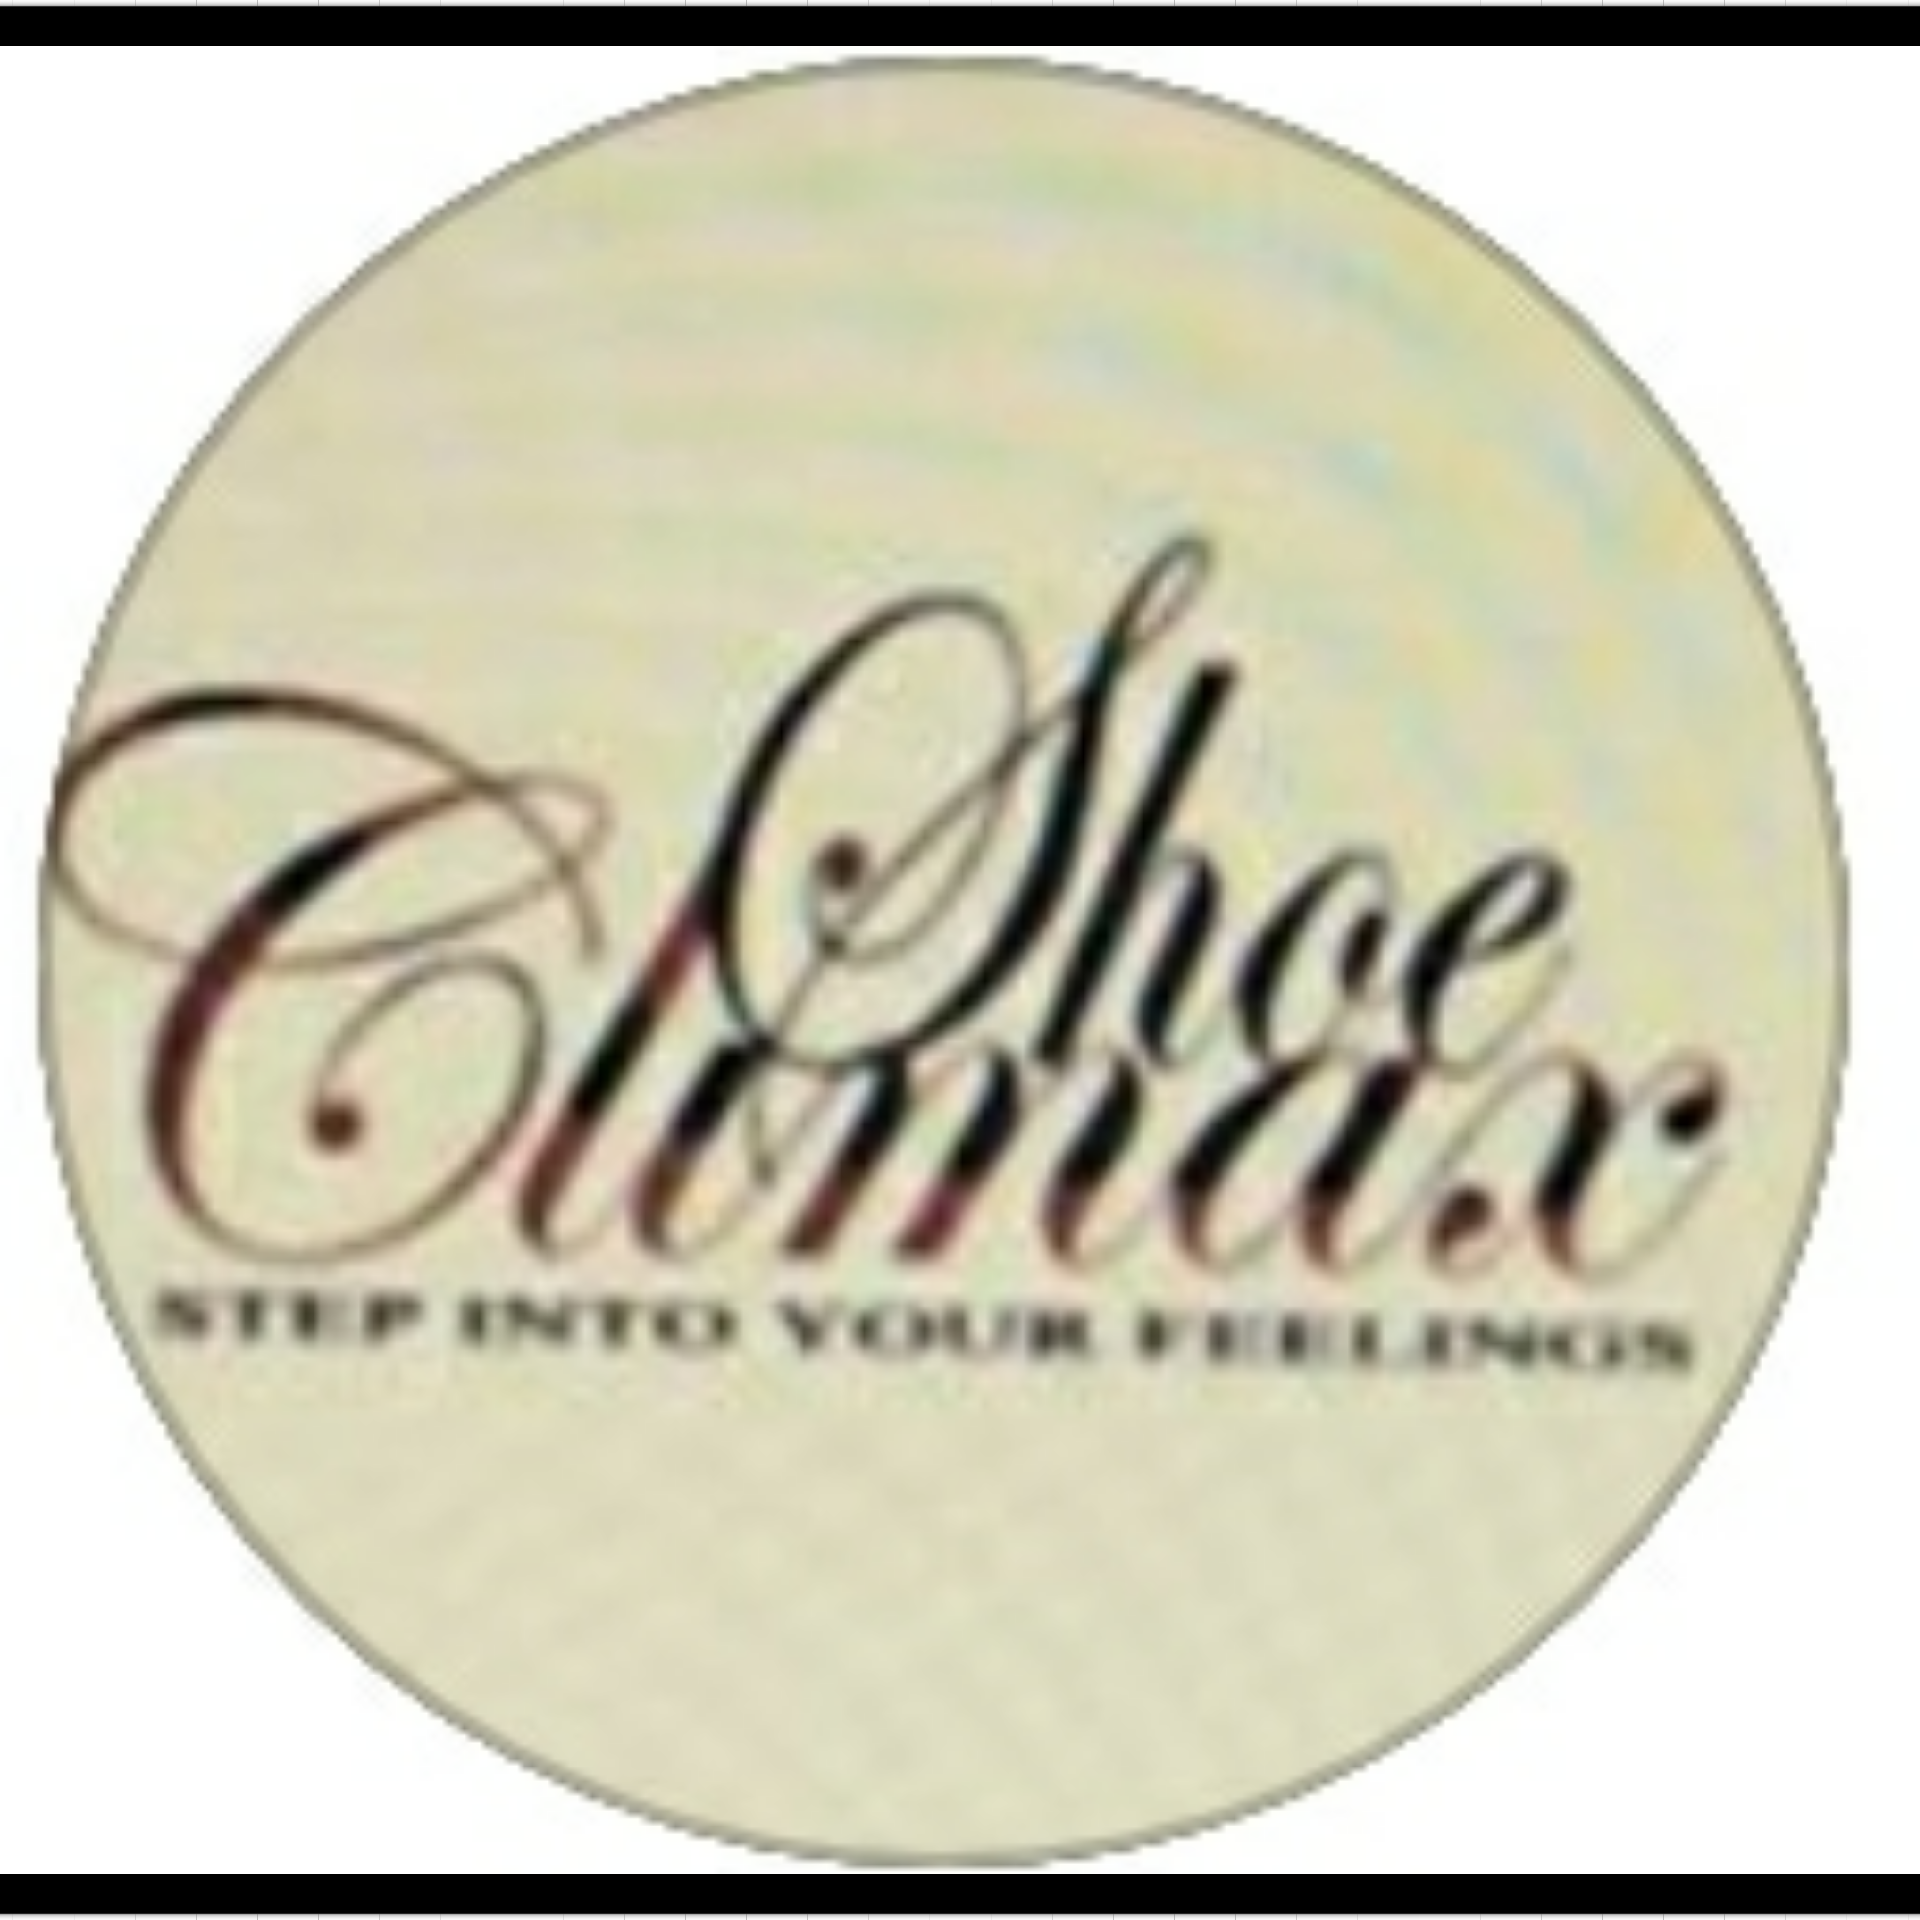 Shoe Climax LLC